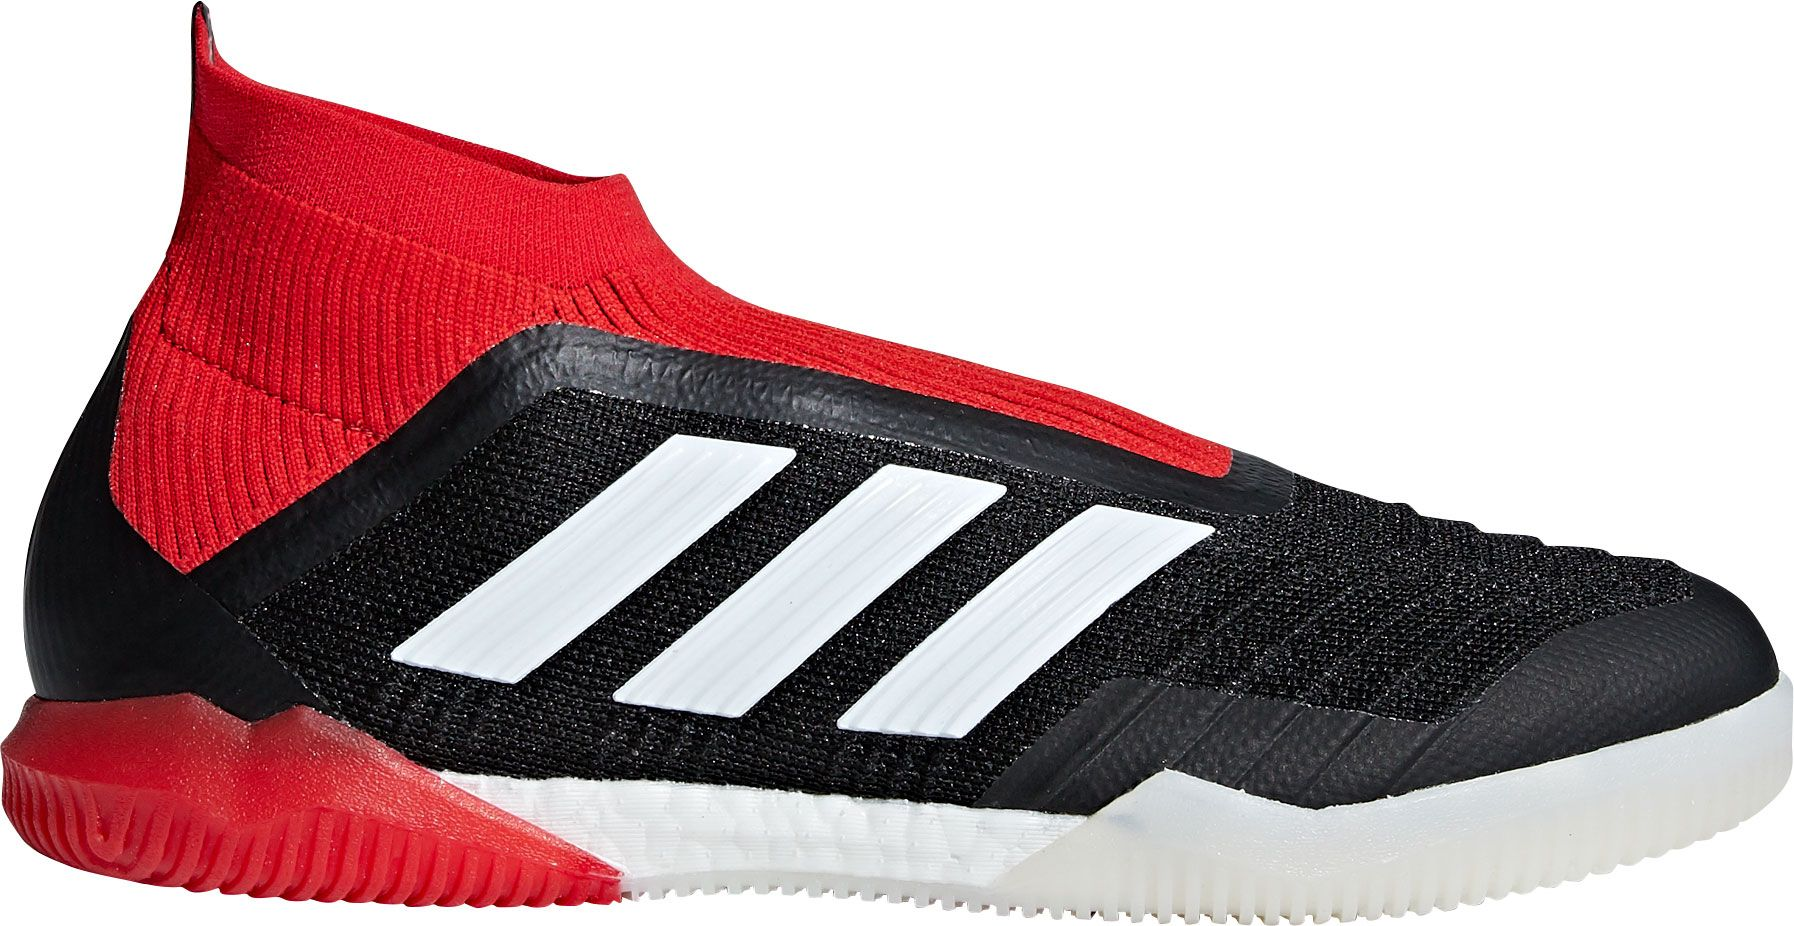 adidas Men's Predator 18+ Indoor Soccer Shoes, Size: 11.0, Black